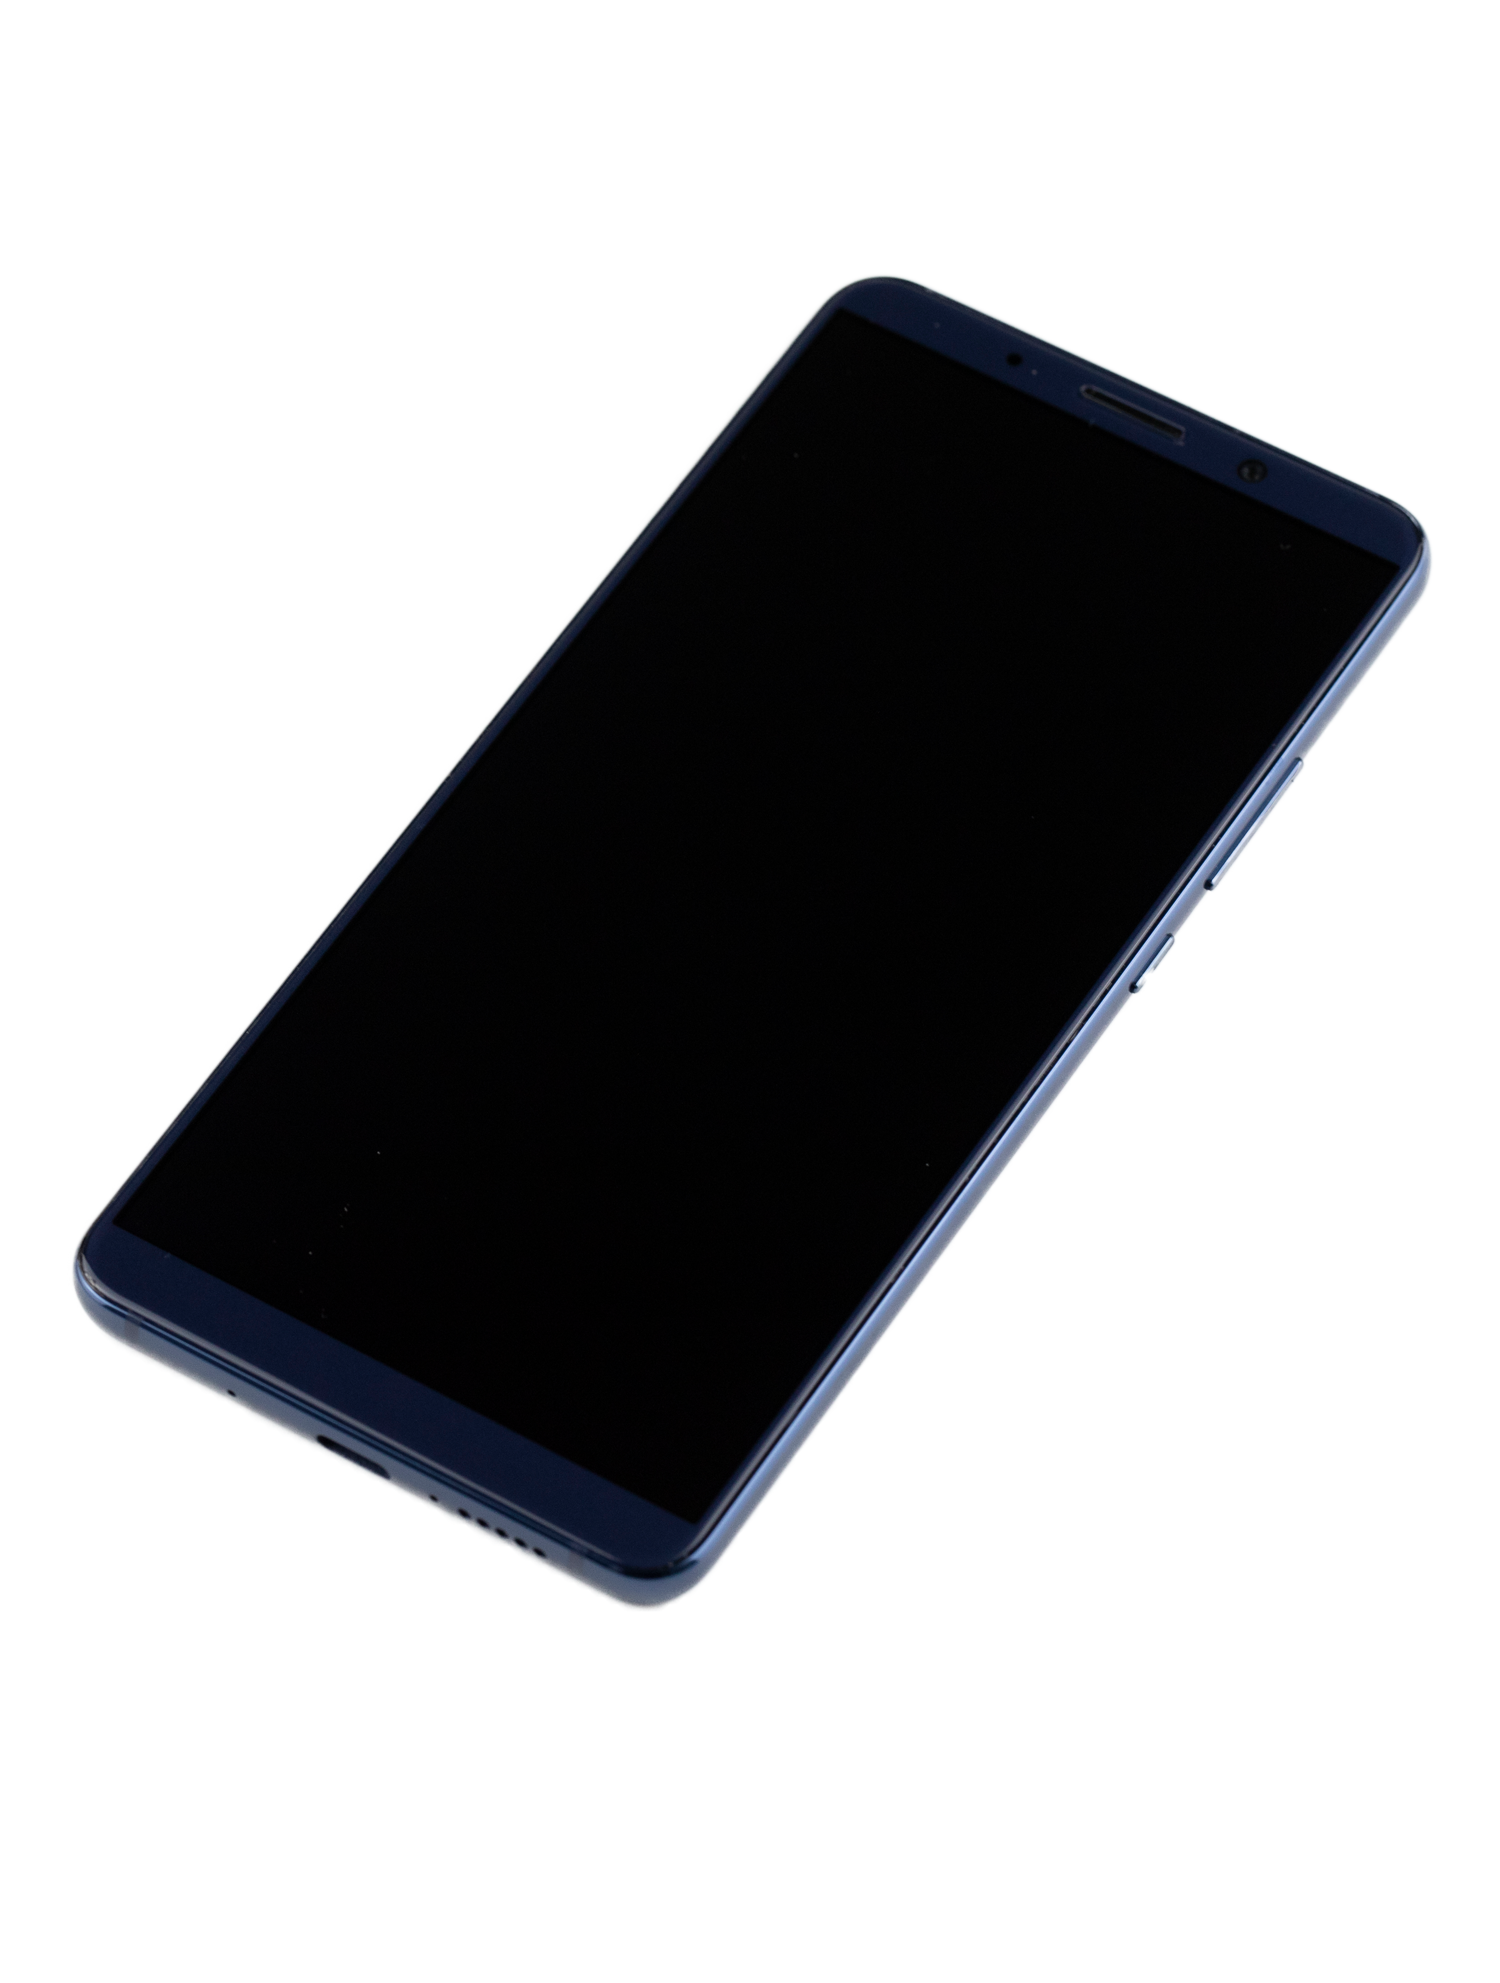 Huawei Mate 10 Pro BLA-L09 Display Module + Frame Blue